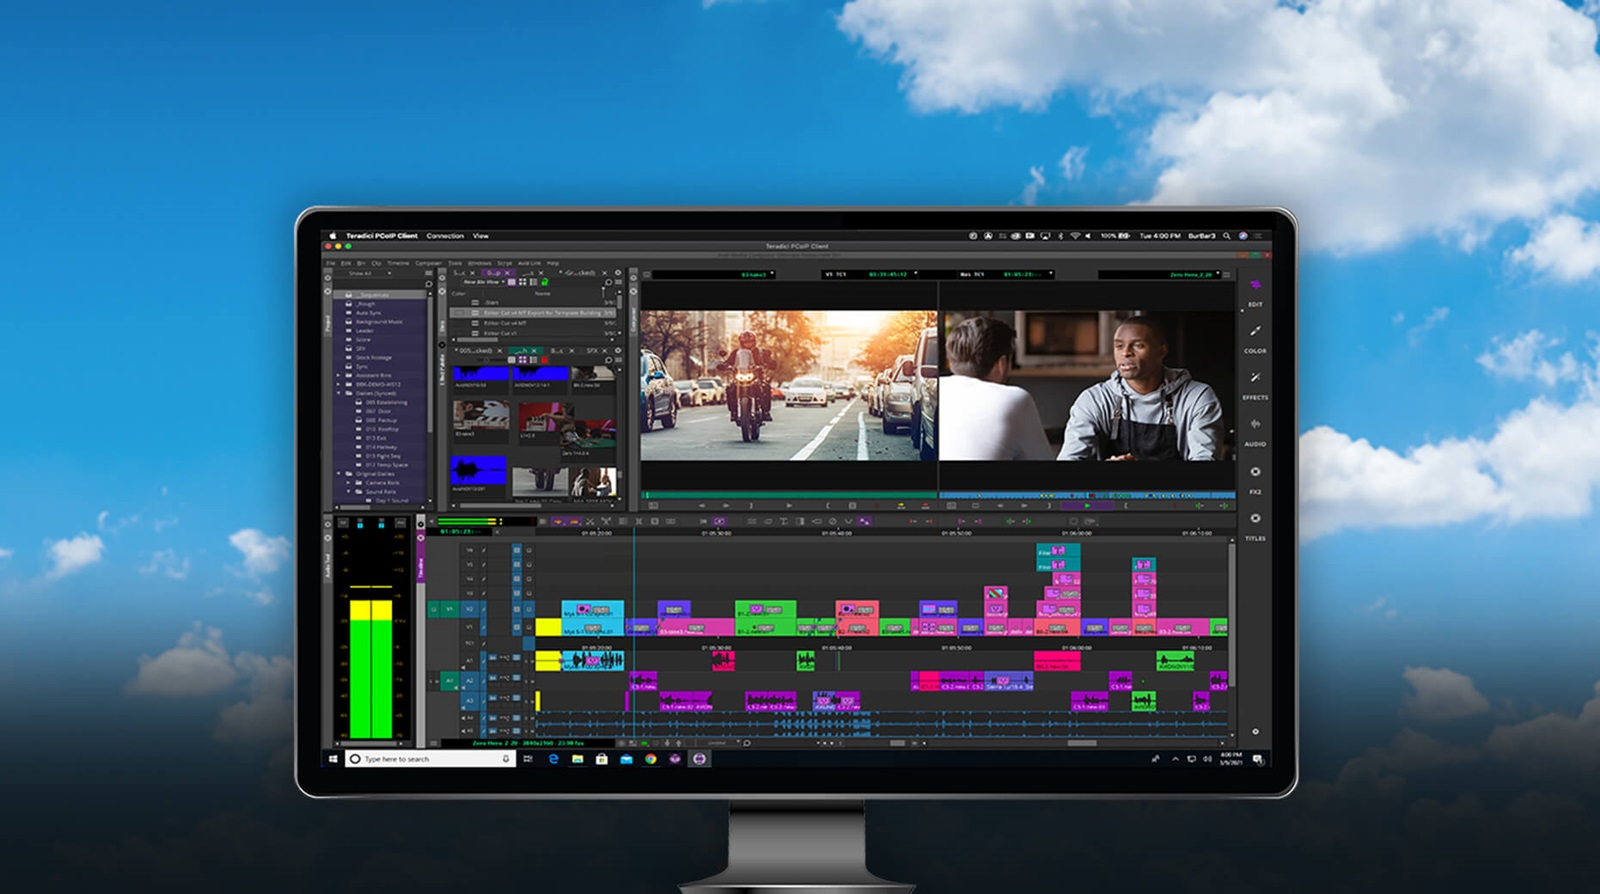 Media Composer UI superimposed over cloud background